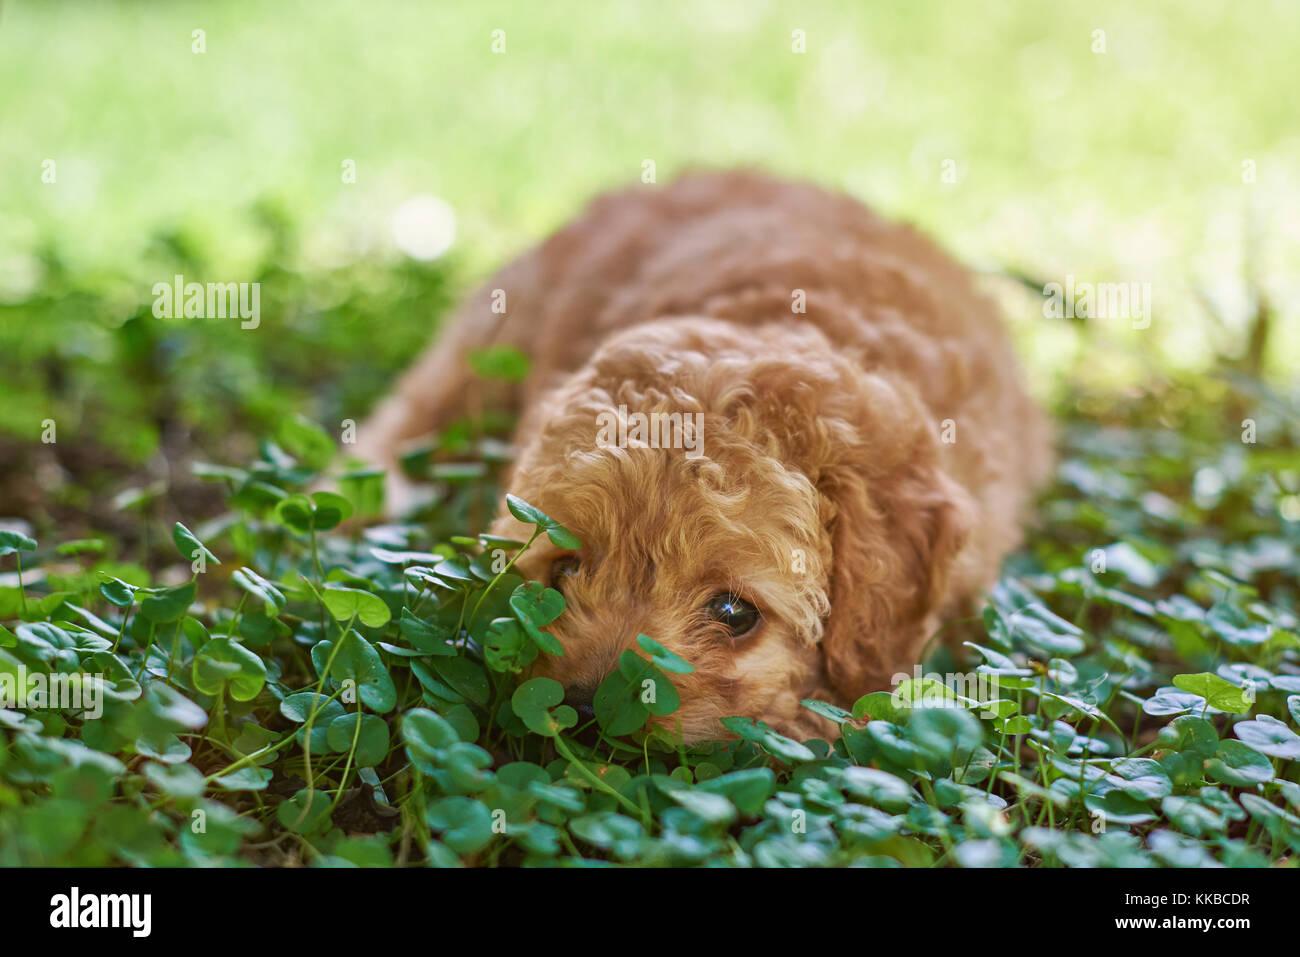 Chocolate Poodle Garden Stock Photos Chocolate Poodle Garden Stock